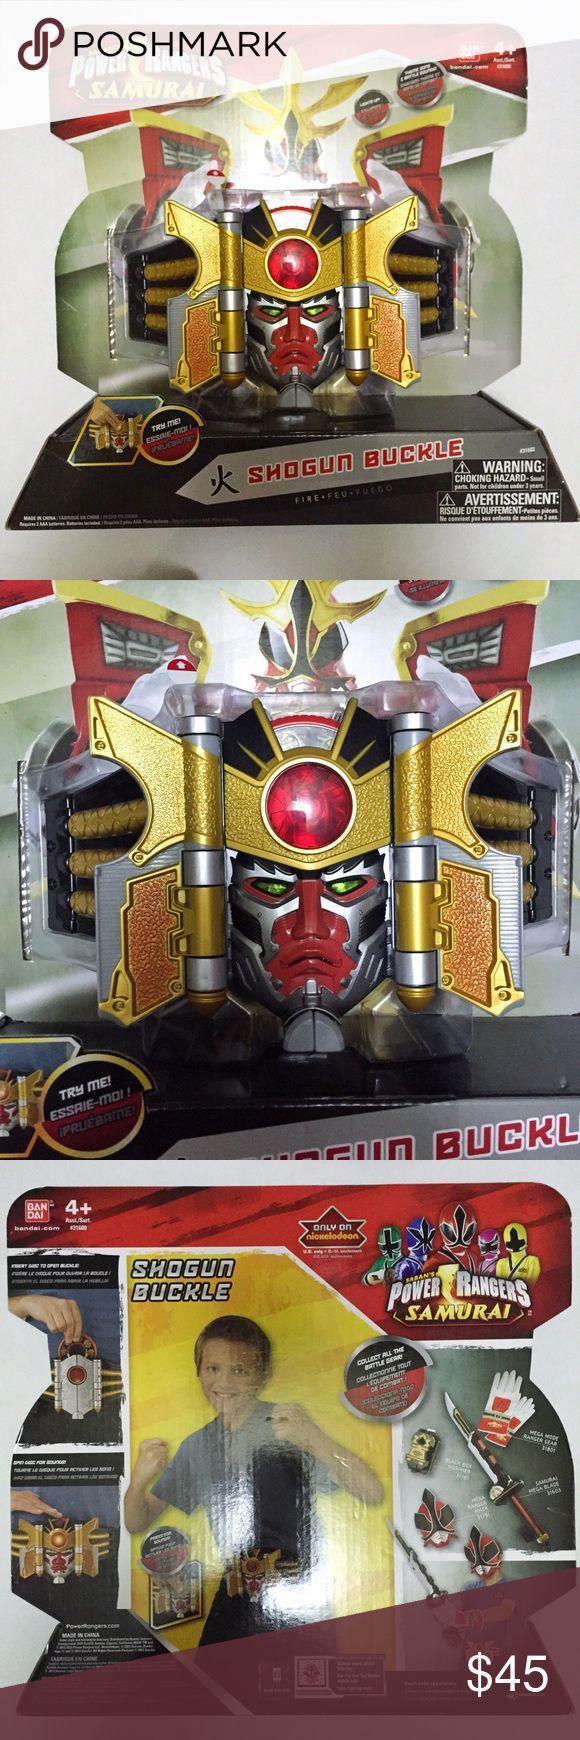 Selling this Power Rangers Samurai Shogun Buckle on Poshmark! My username is: refineselection. #shopmycloset #poshmark #fashion #shopping #style #forsale #Bandai #Other